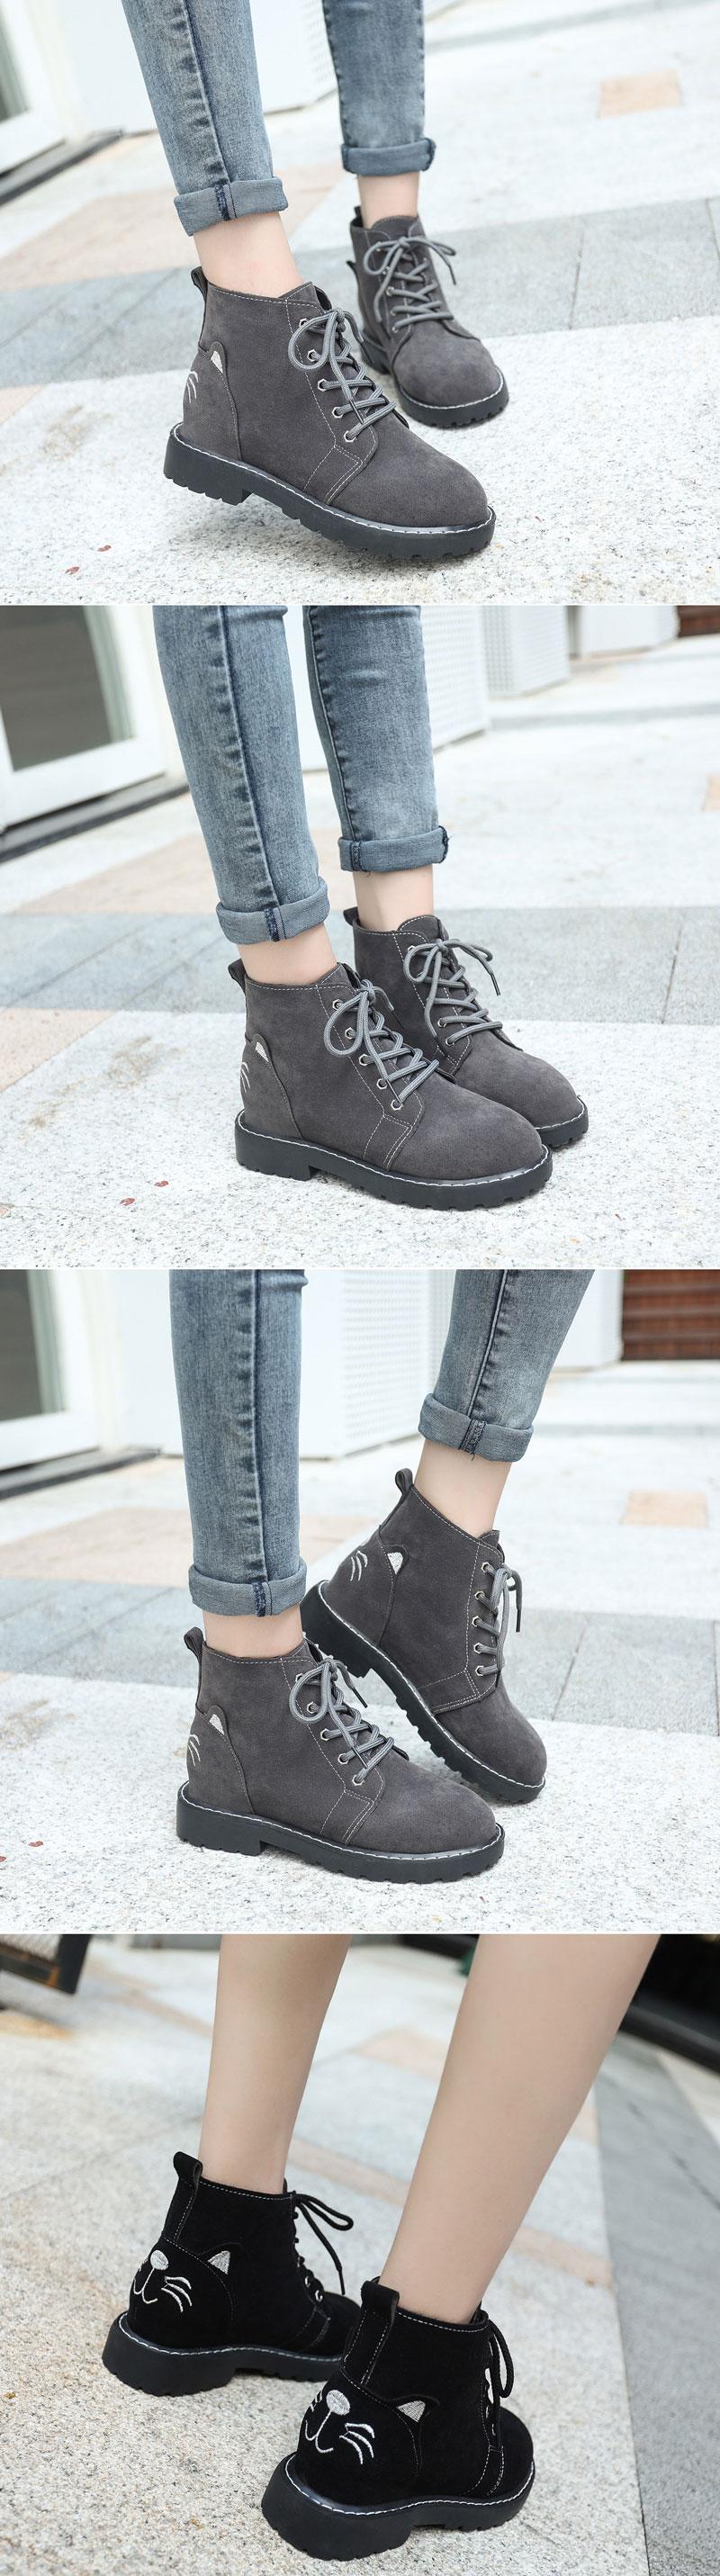 chaussure femme pas cher